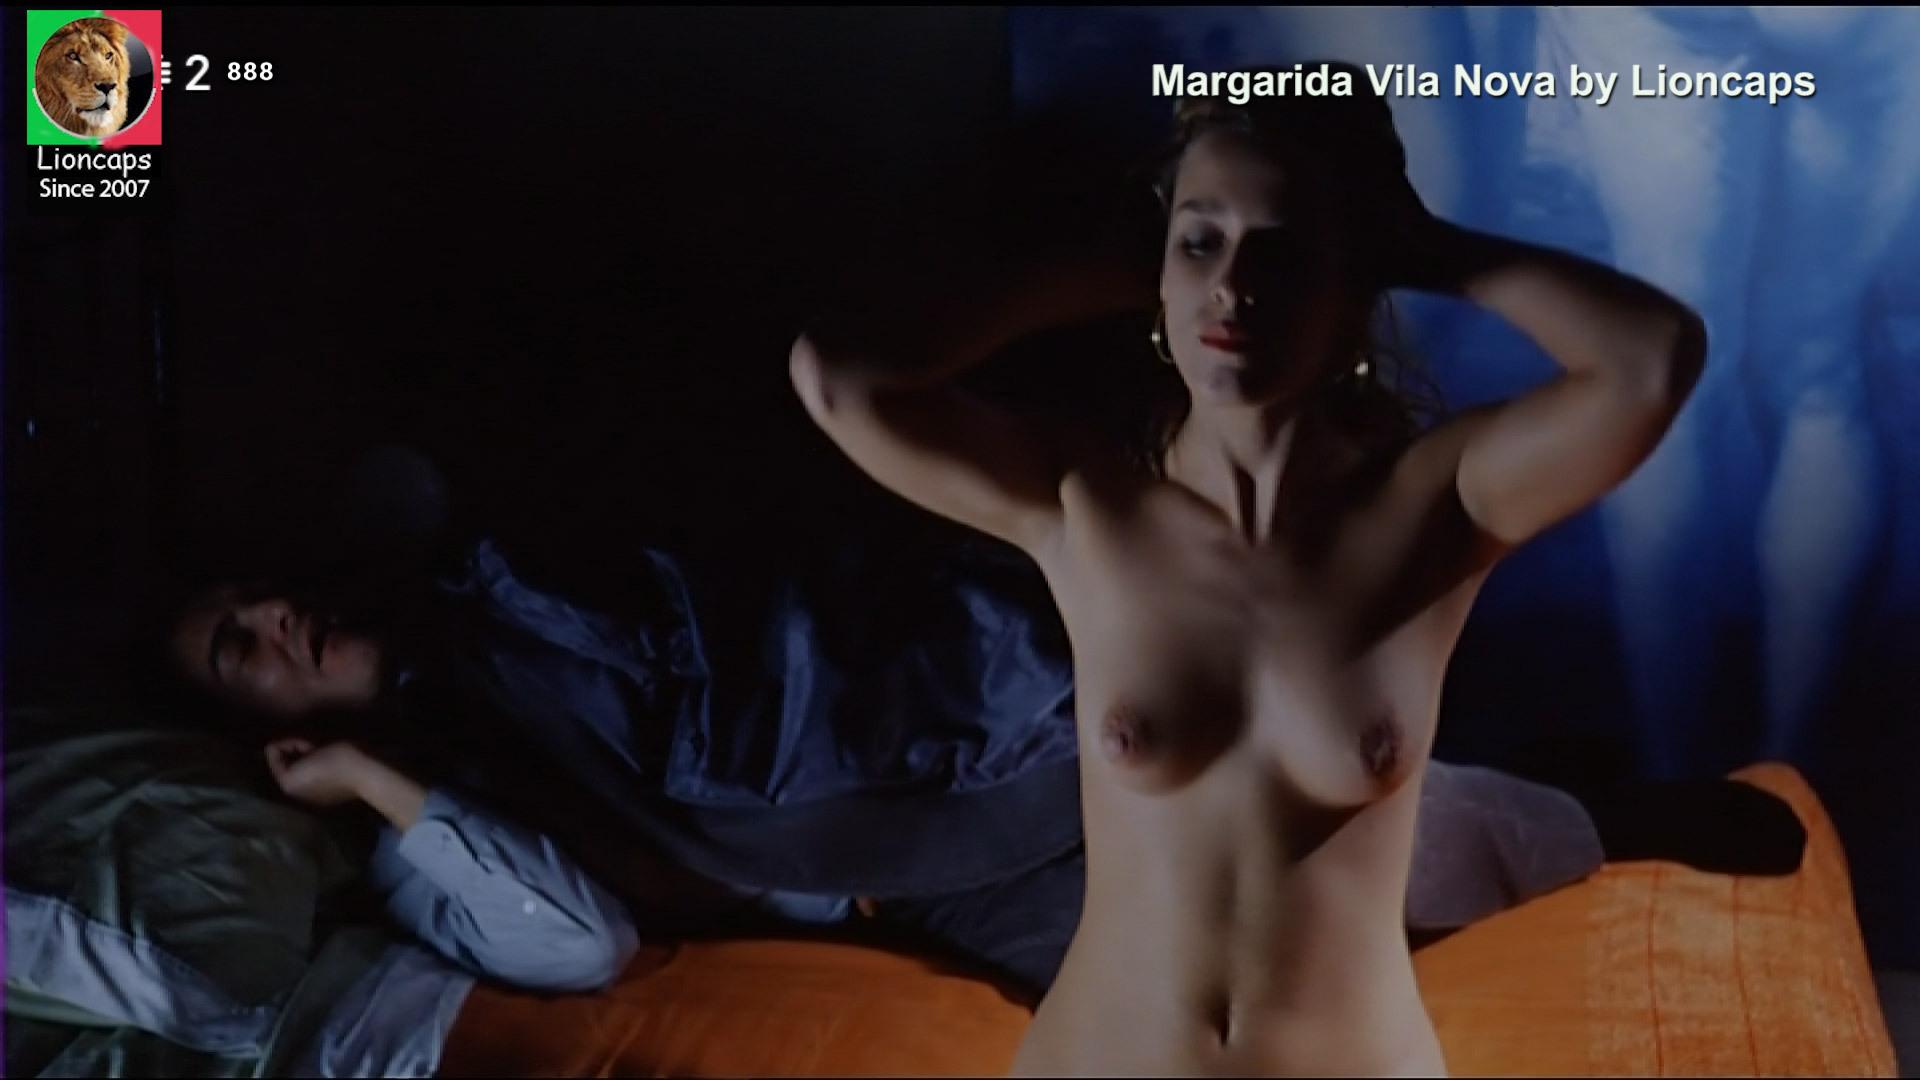 margarida_vila_nova (3).jpg